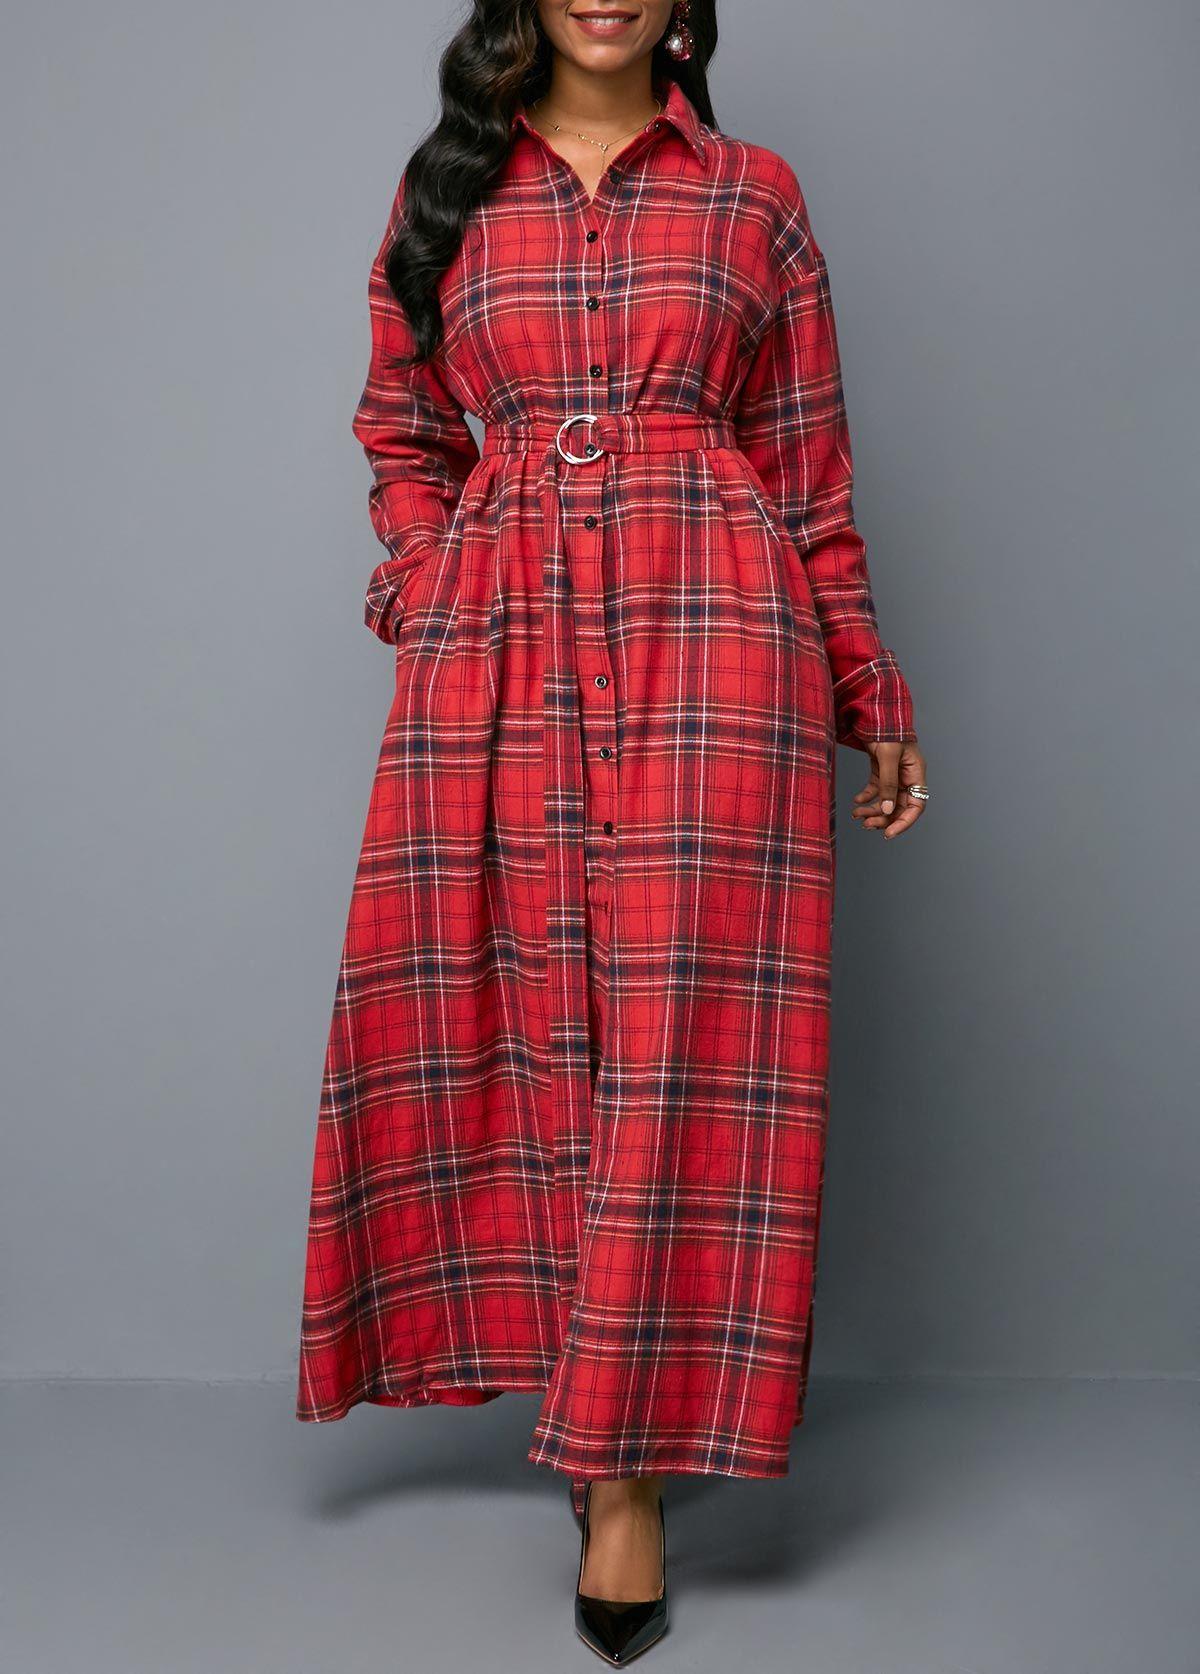 ce7225e57d455 Turndown Collar Button Front Belted Dress | Rotita.com - USD $29.94 ...